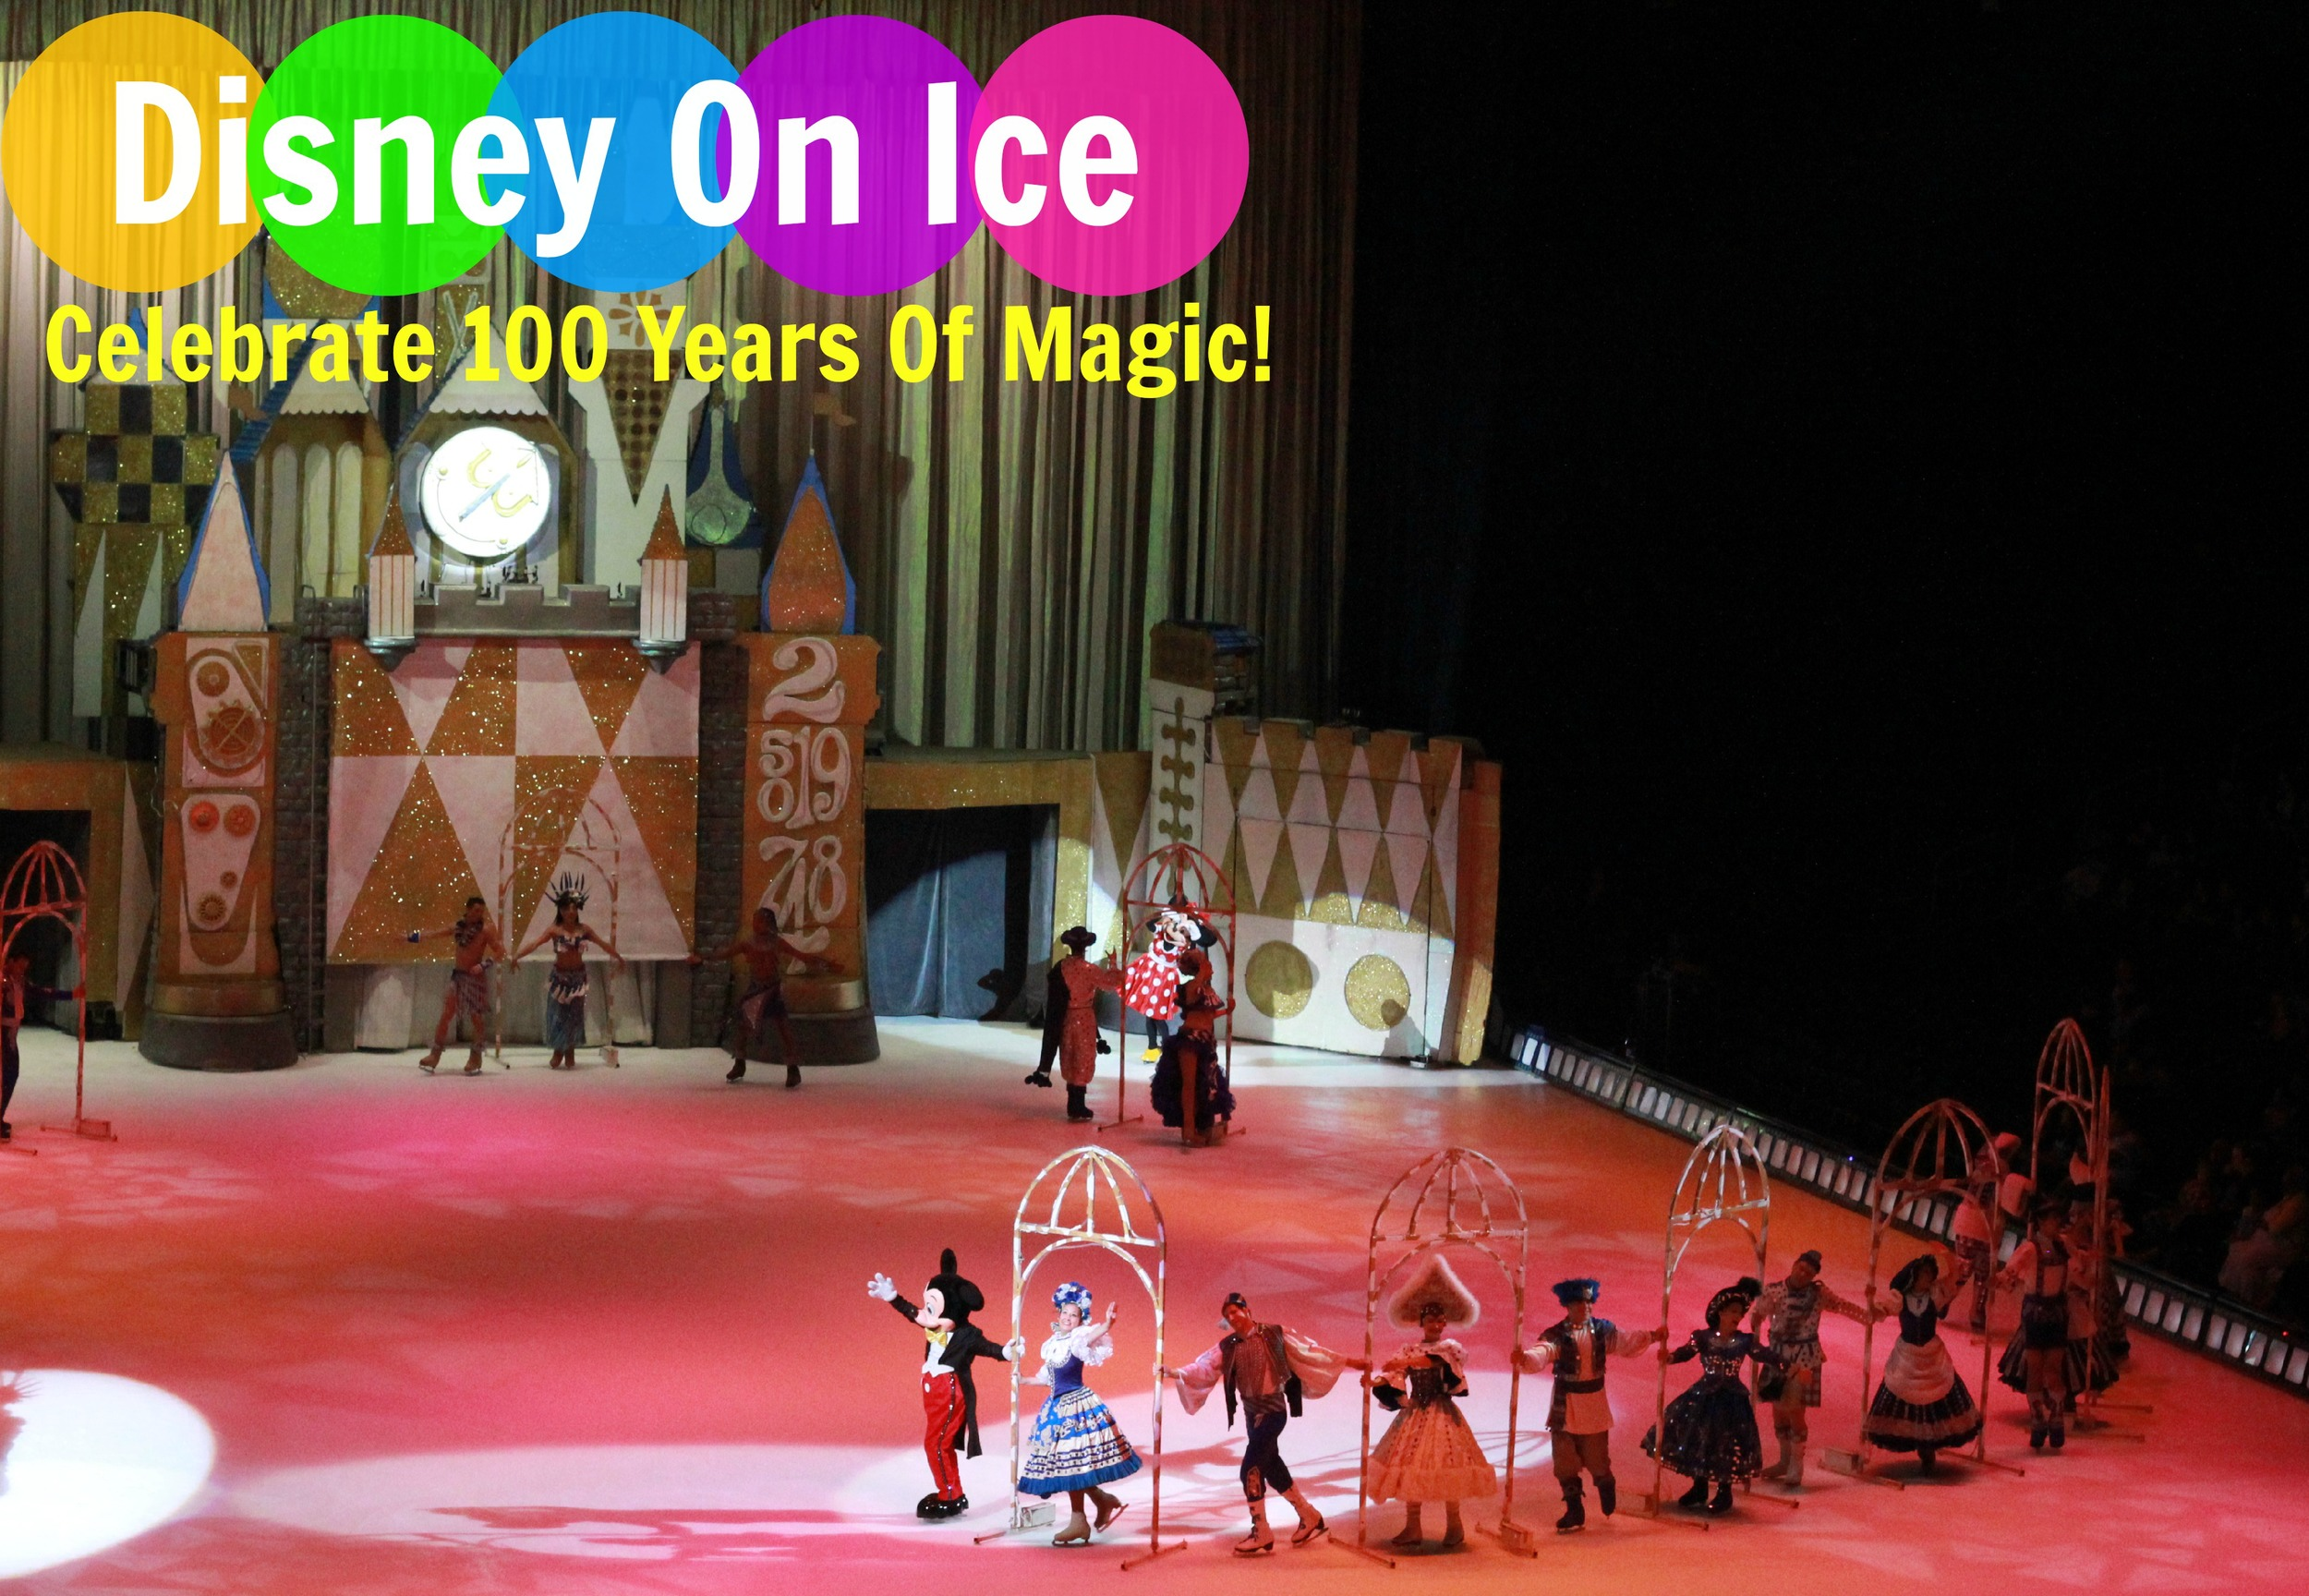 Disney On Ice Celebrates 100 Years Of Magic In Atlanta!